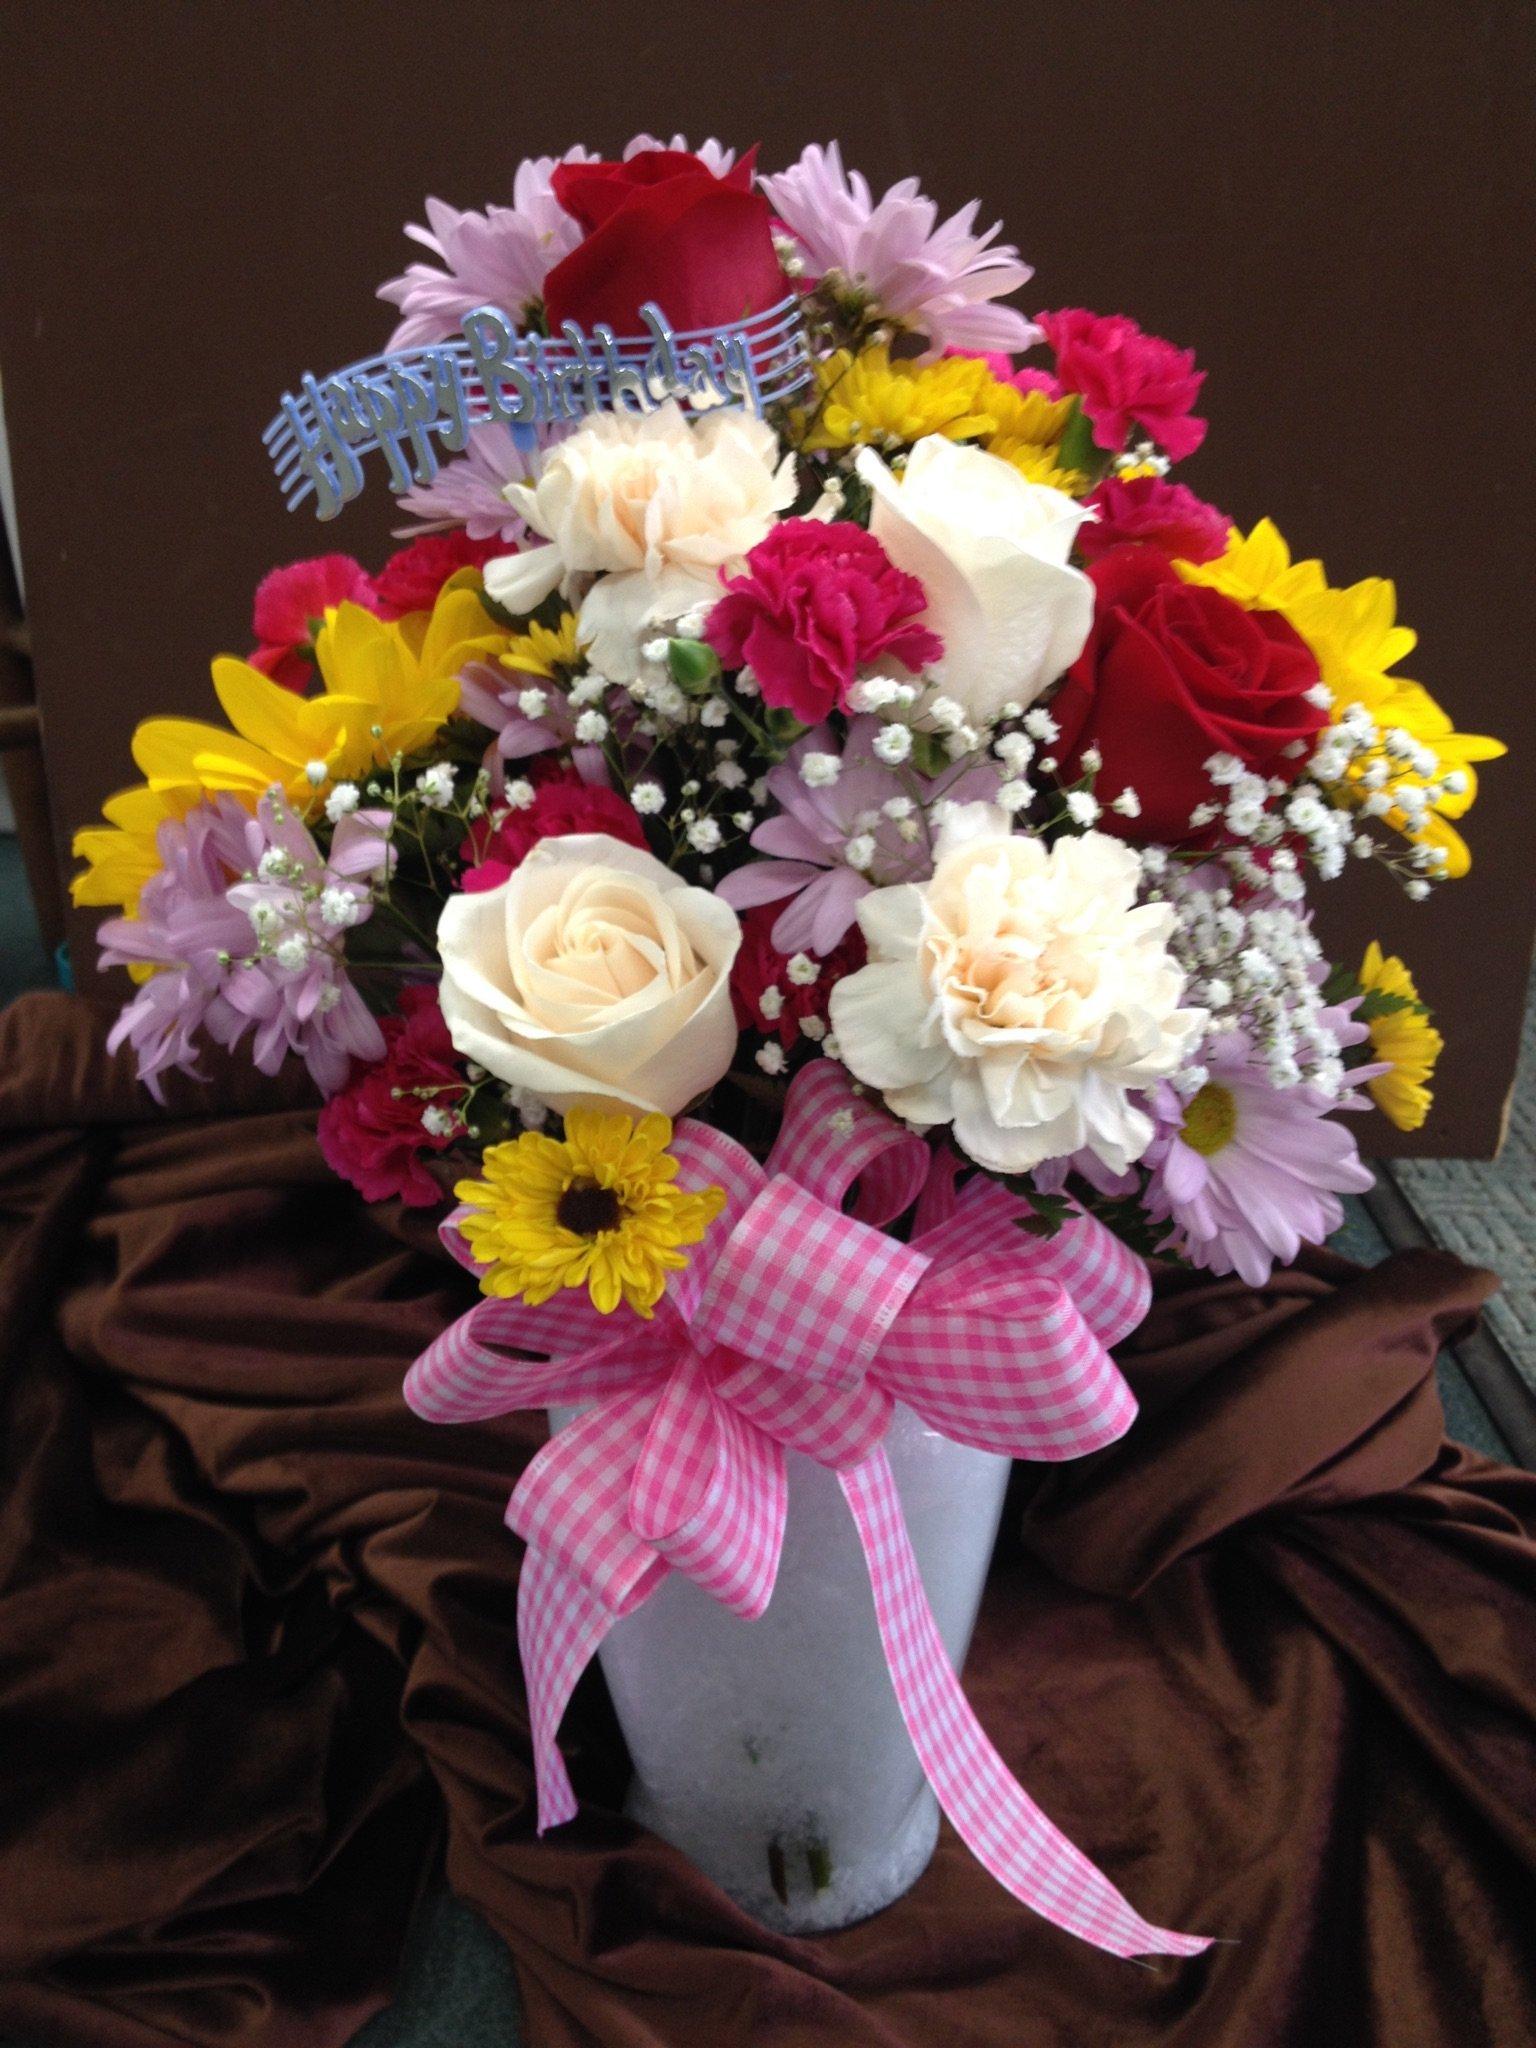 Floral Delivery Gloversville Ny Lohse Florist